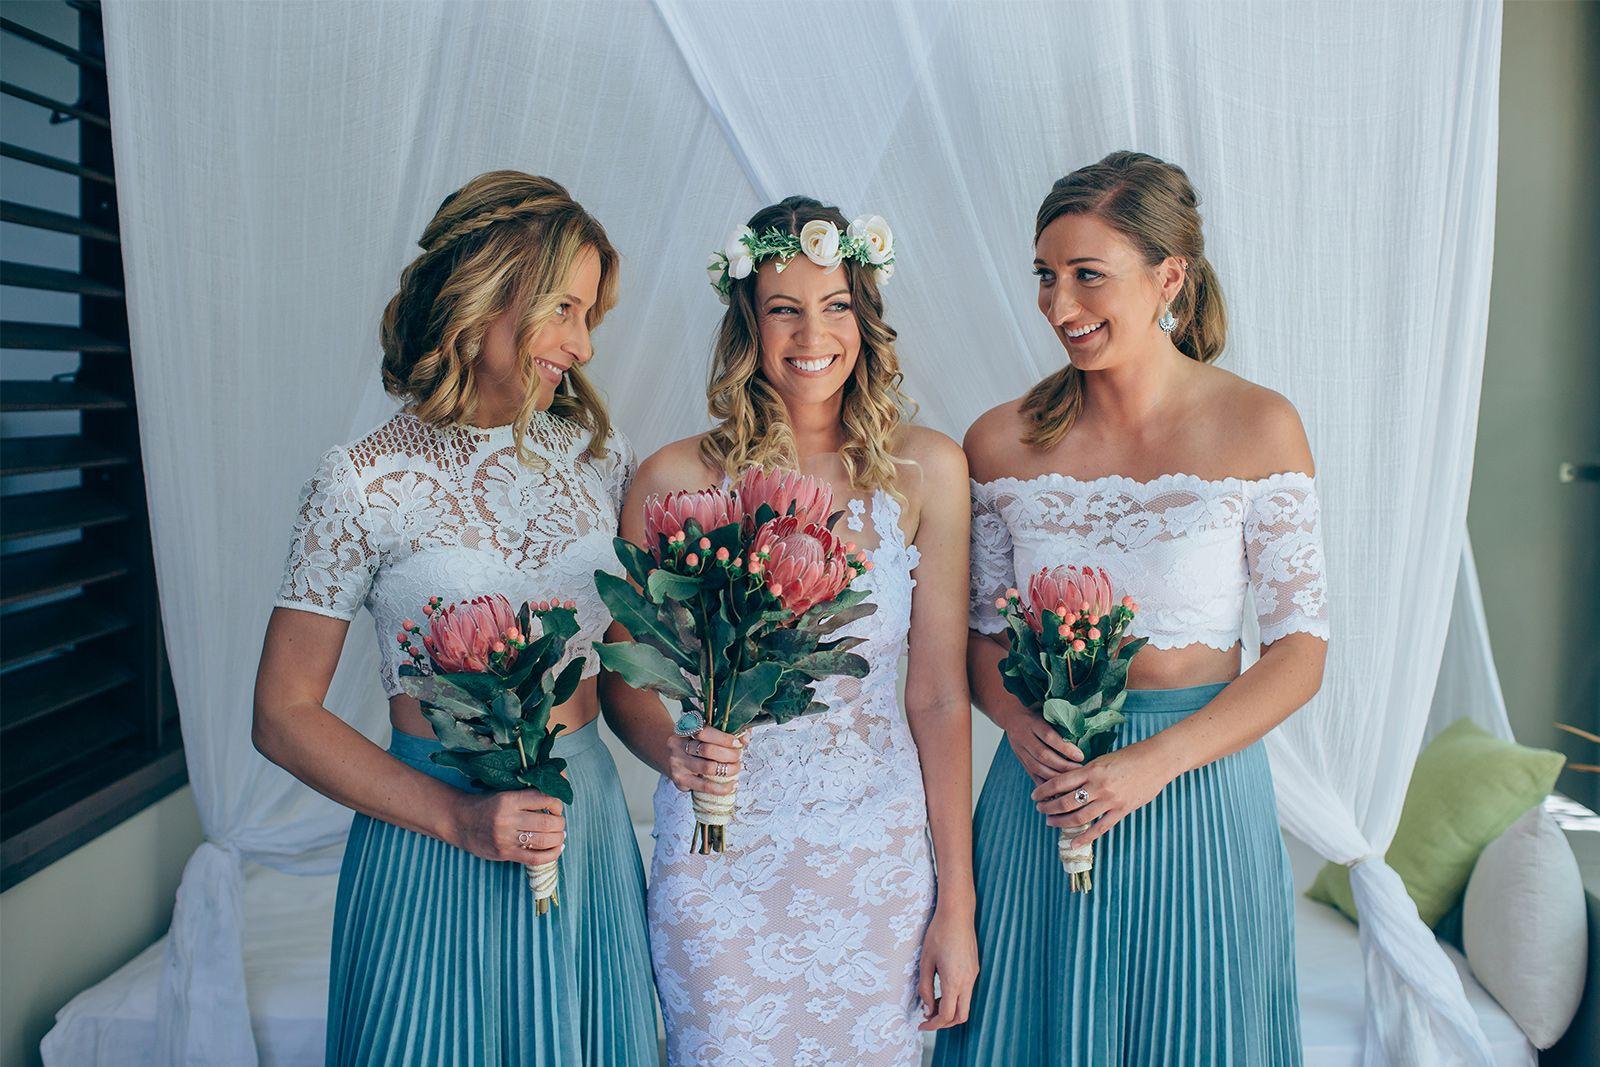 Nandi + Birka in the Gisele | Gisele, Gowns and Weddings